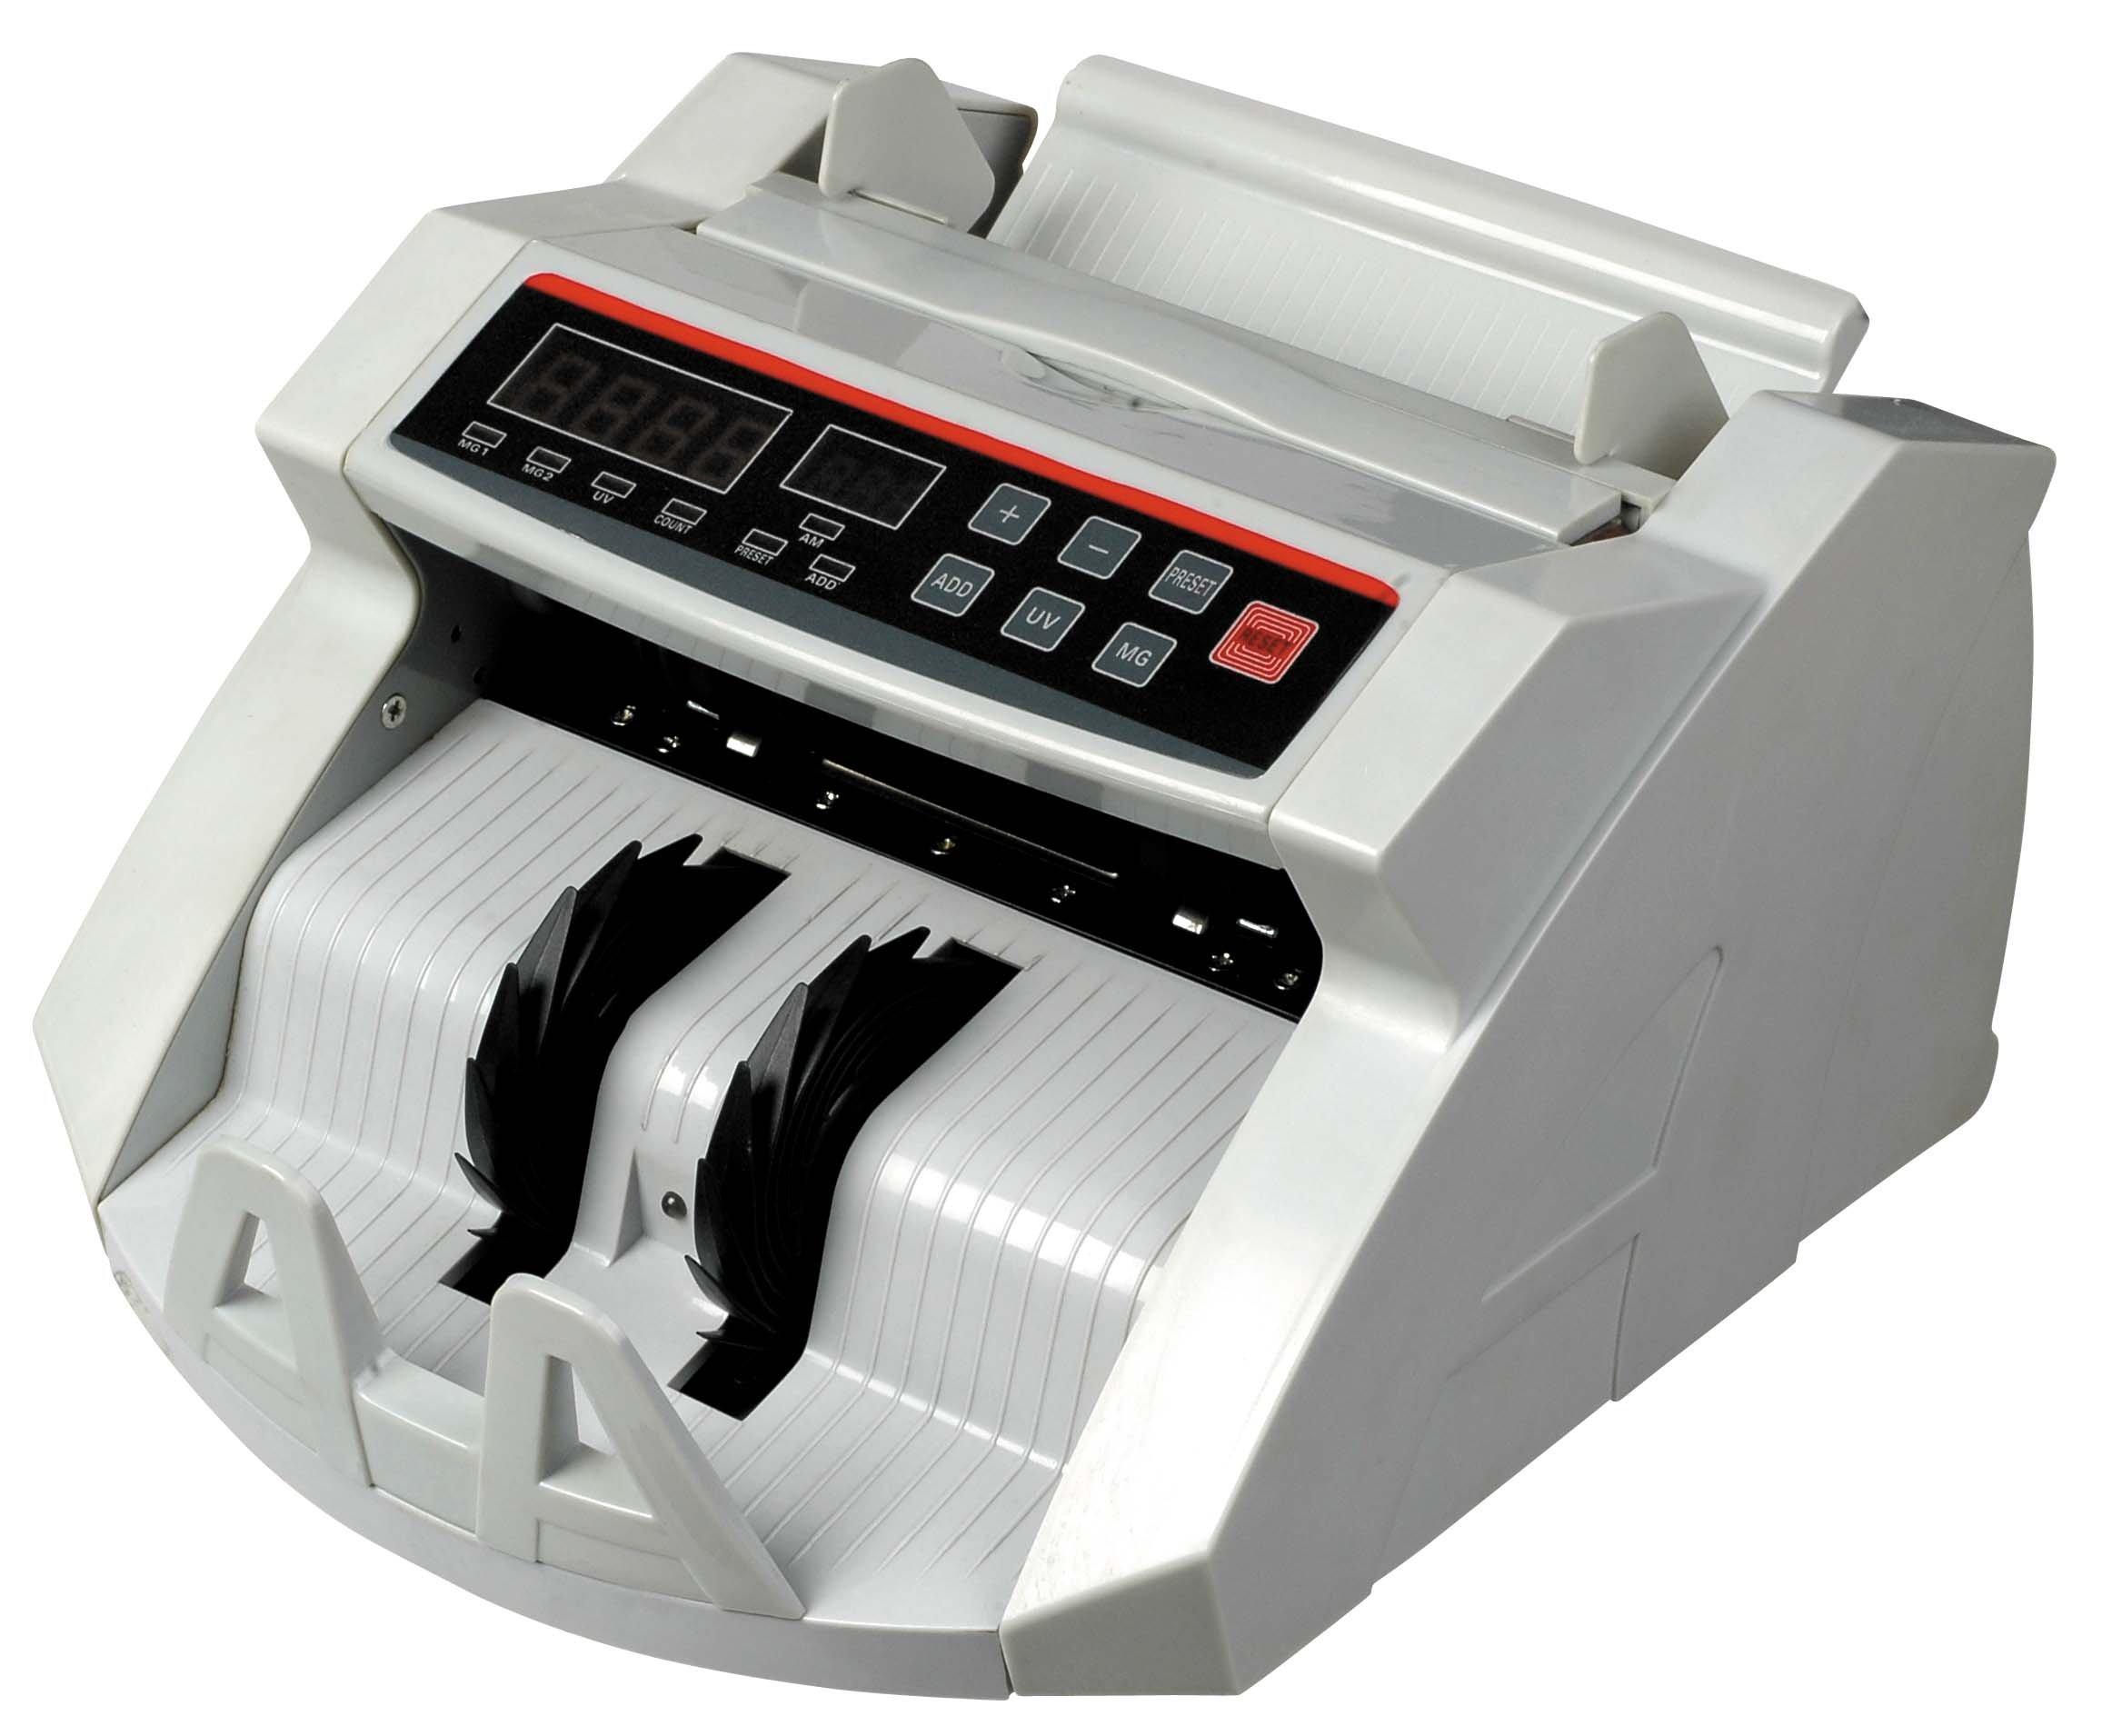 Winixson New Money Bill Counter Counting Machine Counterfeit Detector UV & MG Cash Bank